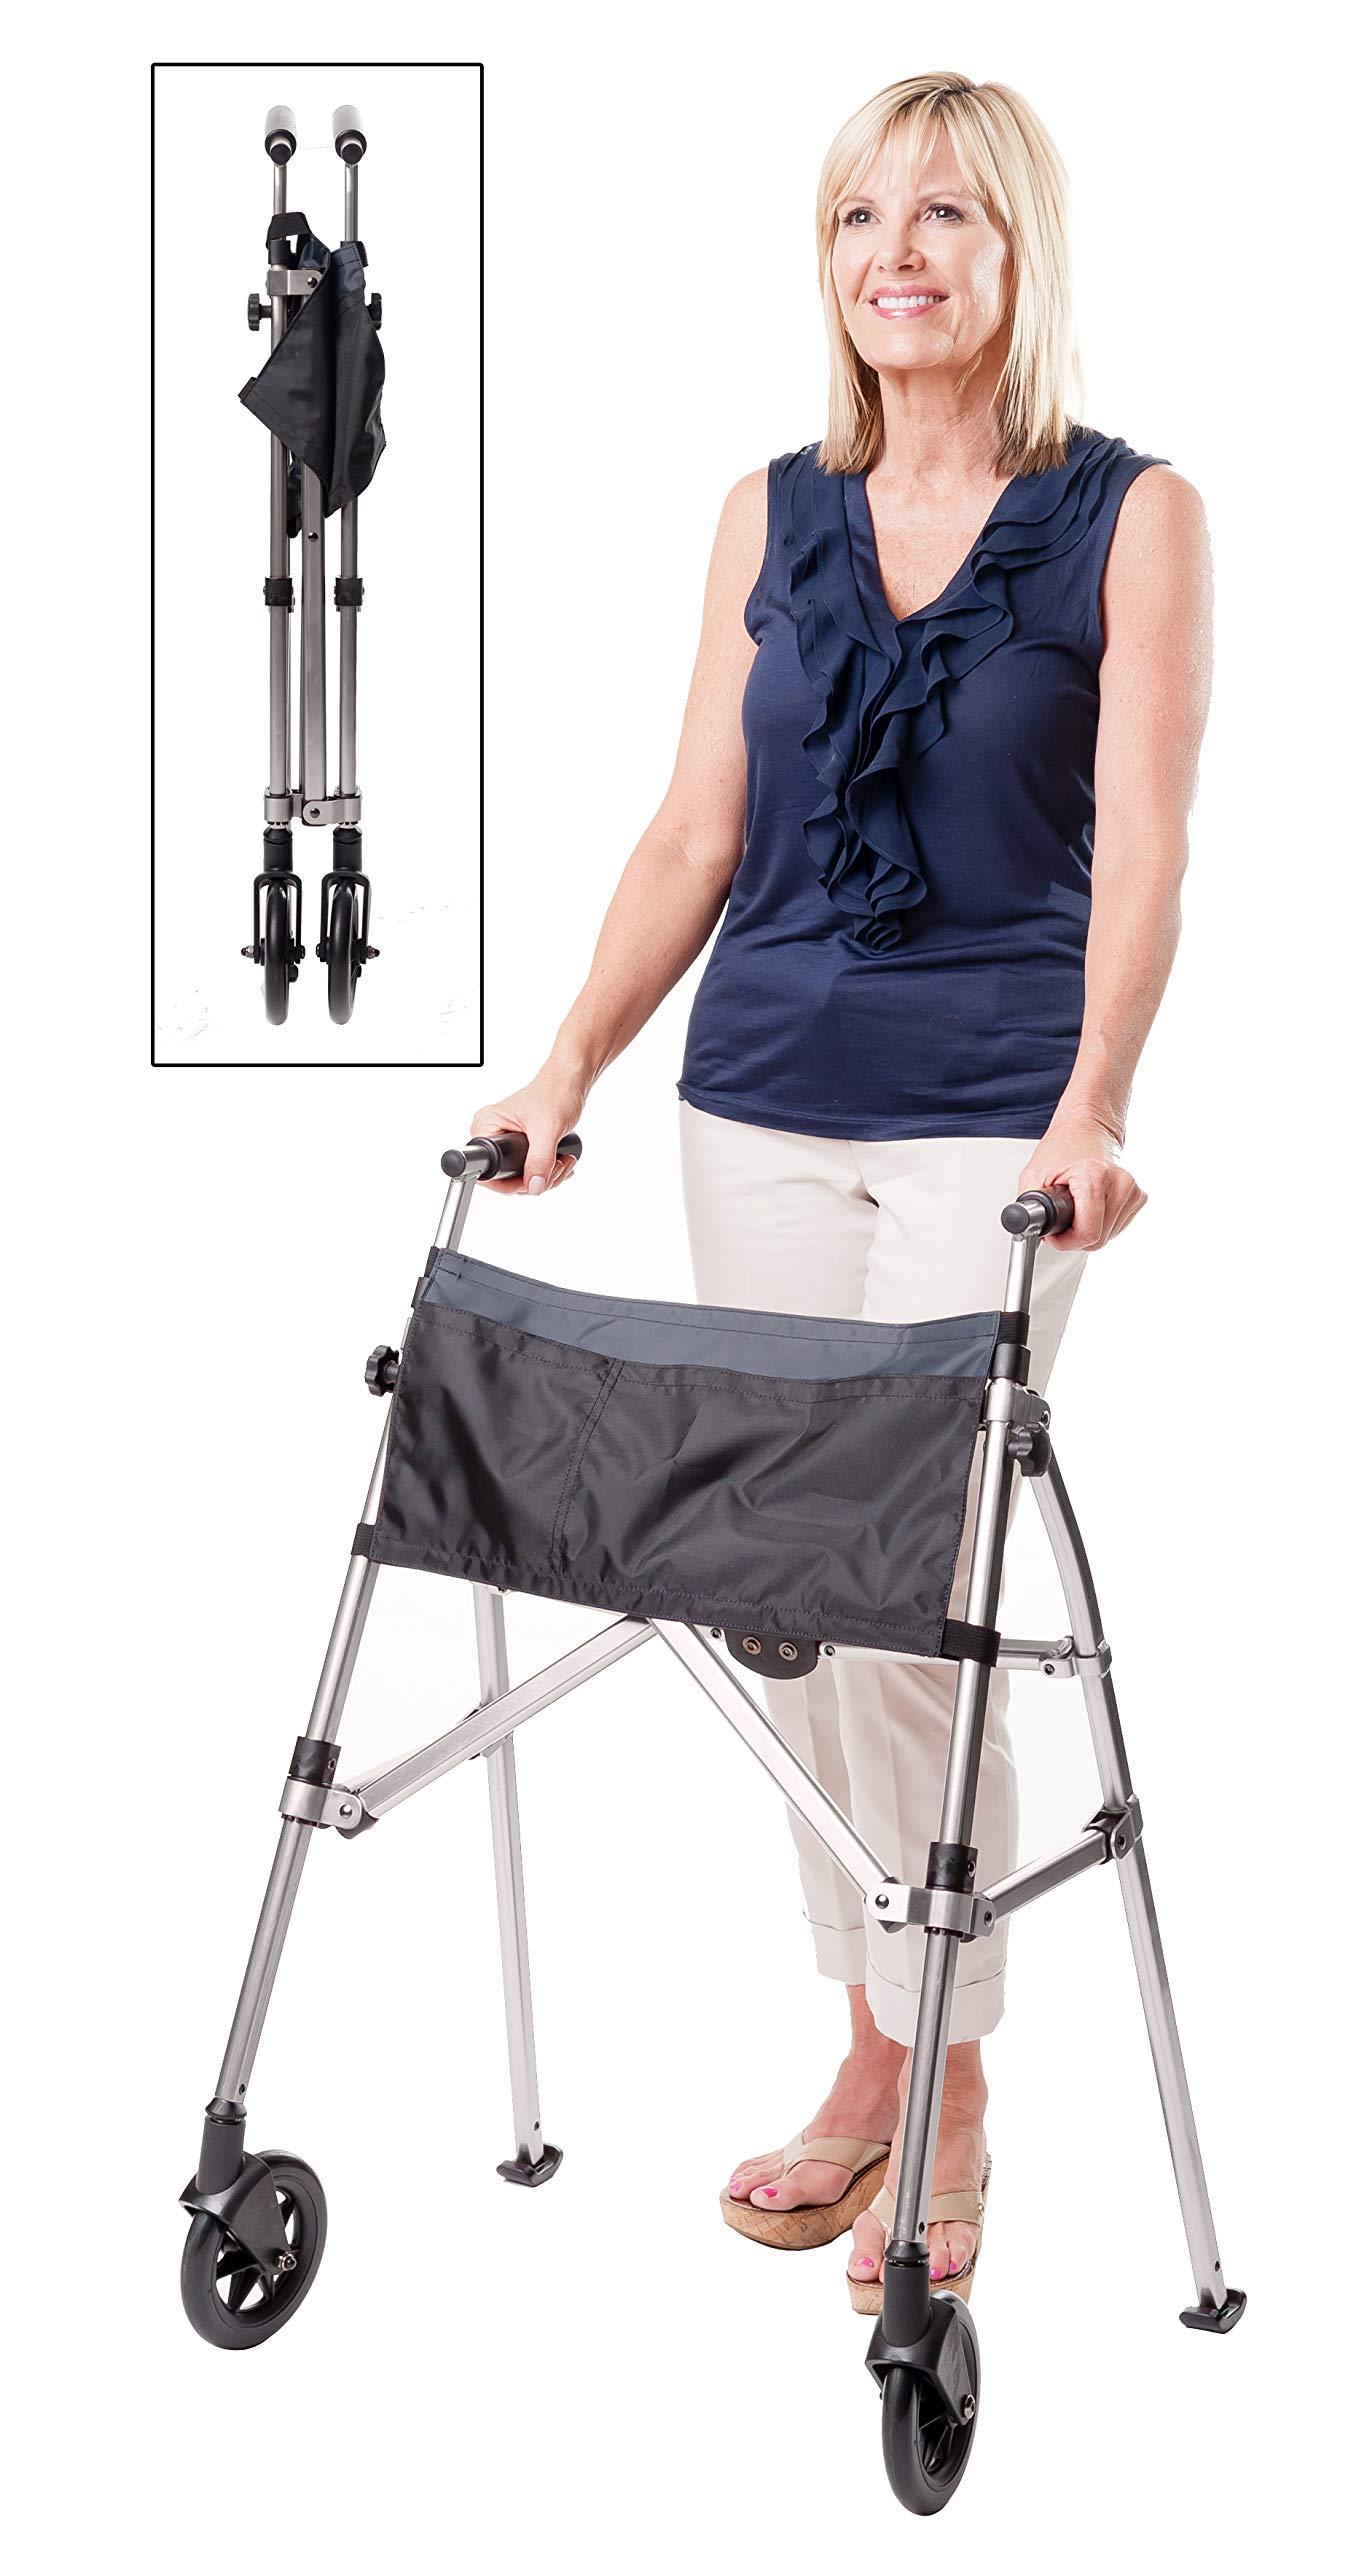 Stander EZ Fold-N-Go Walker - Lightweight Folding & Height Adjustable Adult Travel Walker for Seniors + Locking Swivel Wheels & Pouch - Black Walnut